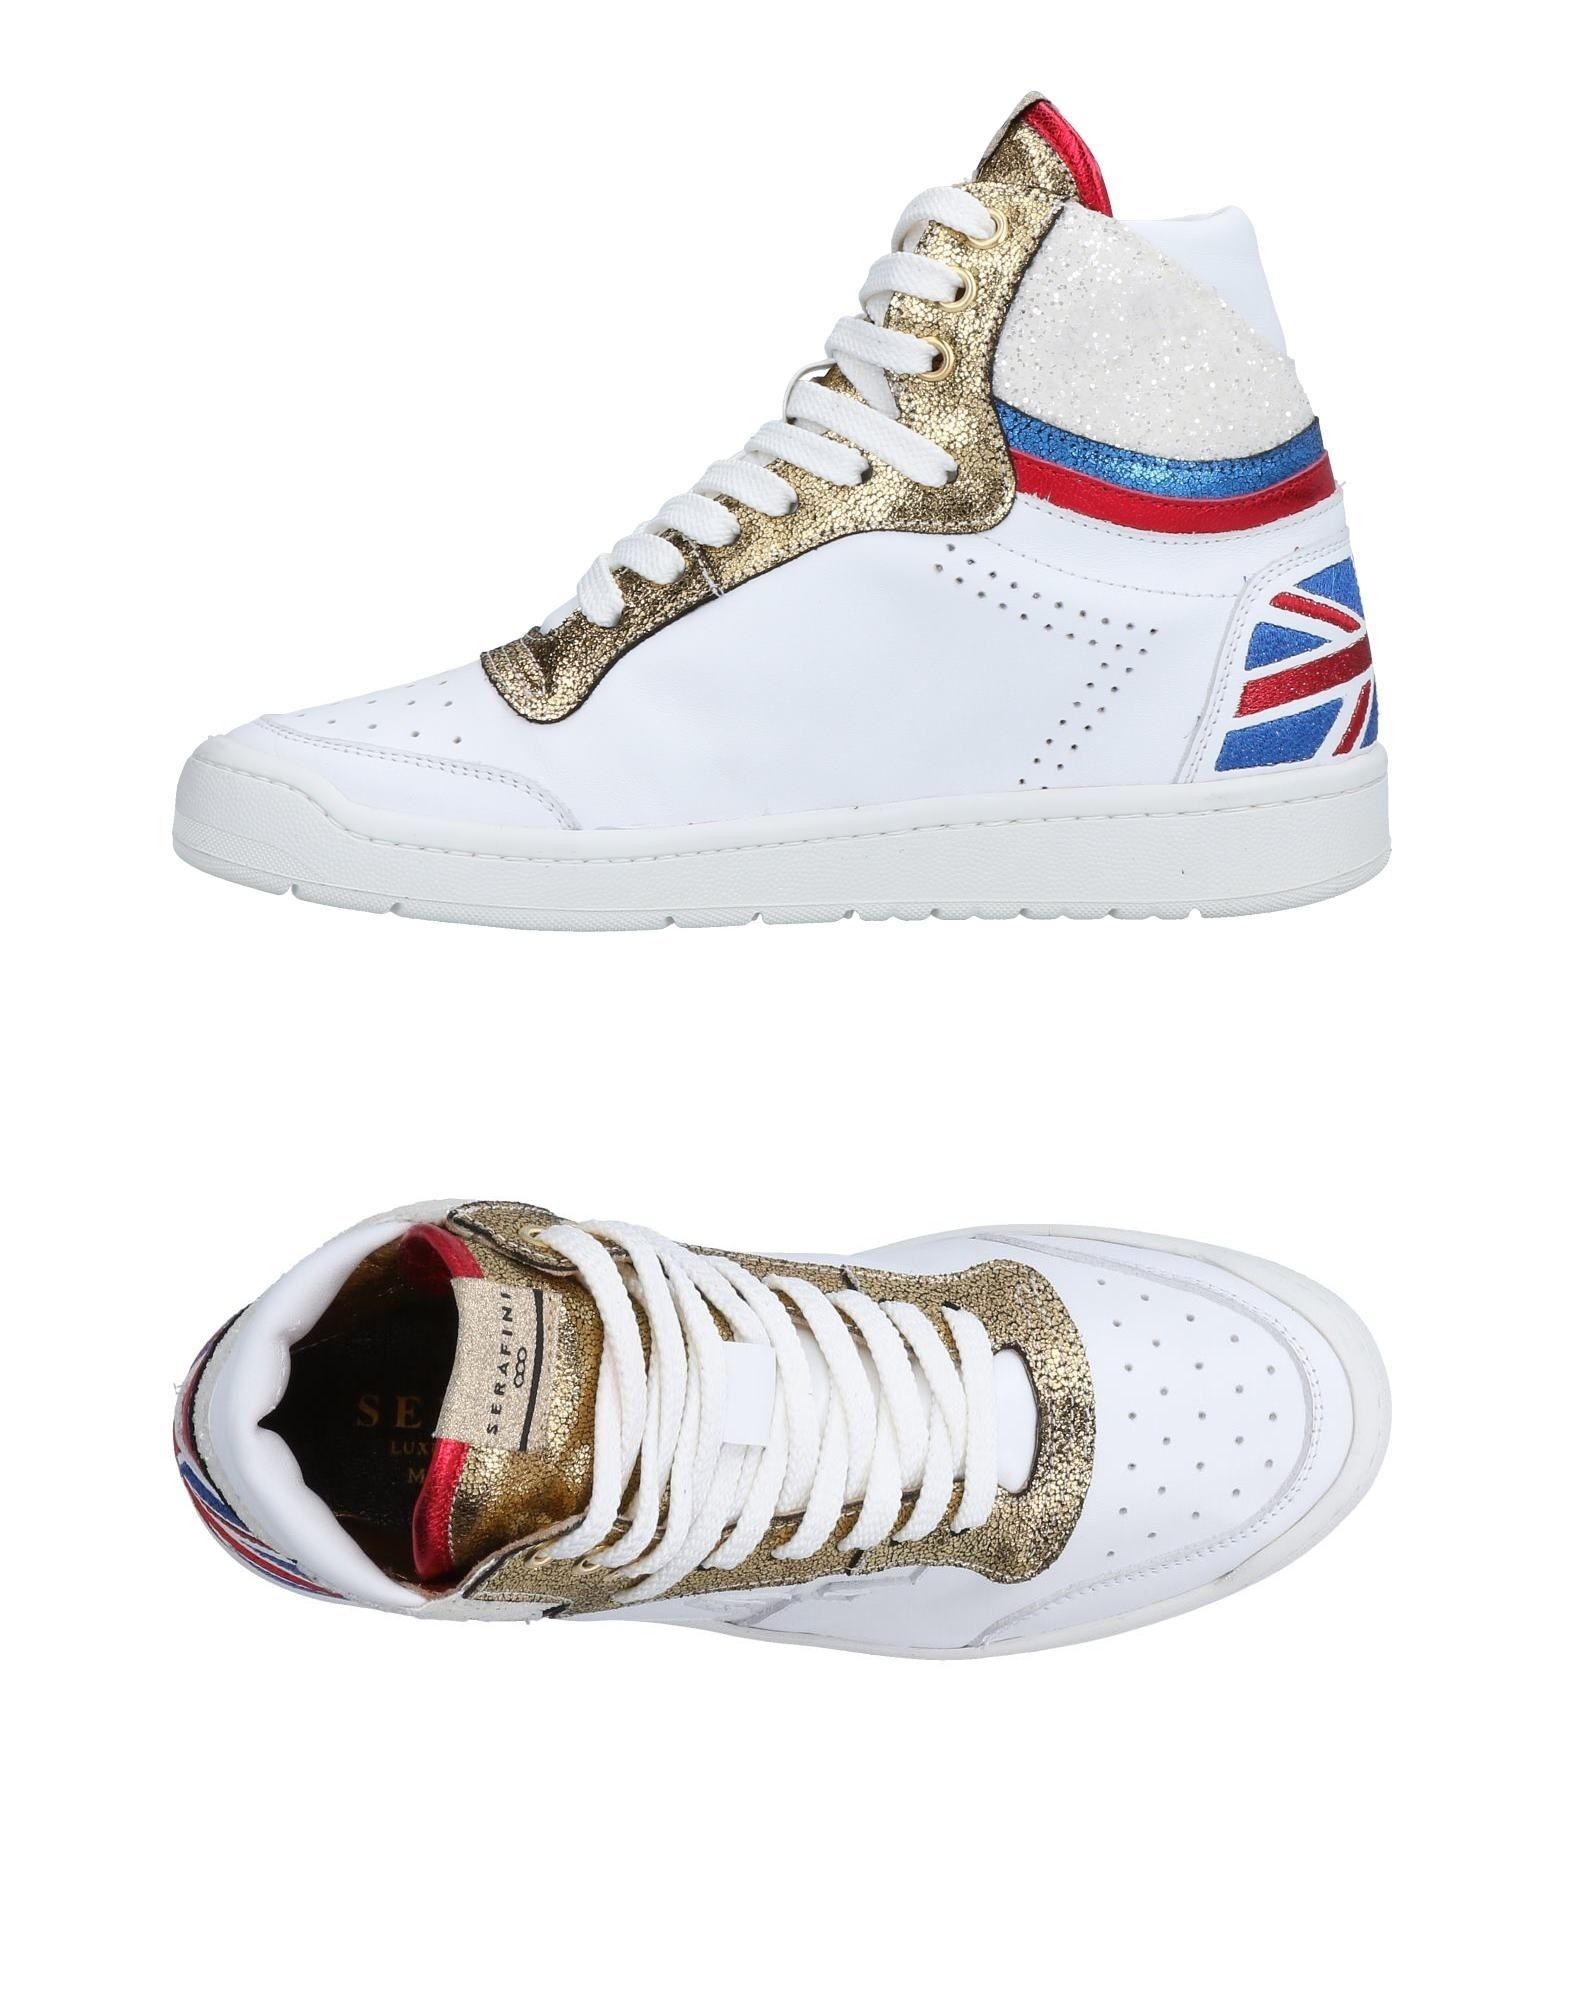 Serafini Luxury Turnschuhes Damen 11512168PVGut 11512168PVGut Damen aussehende strapazierfähige Schuhe e07d80